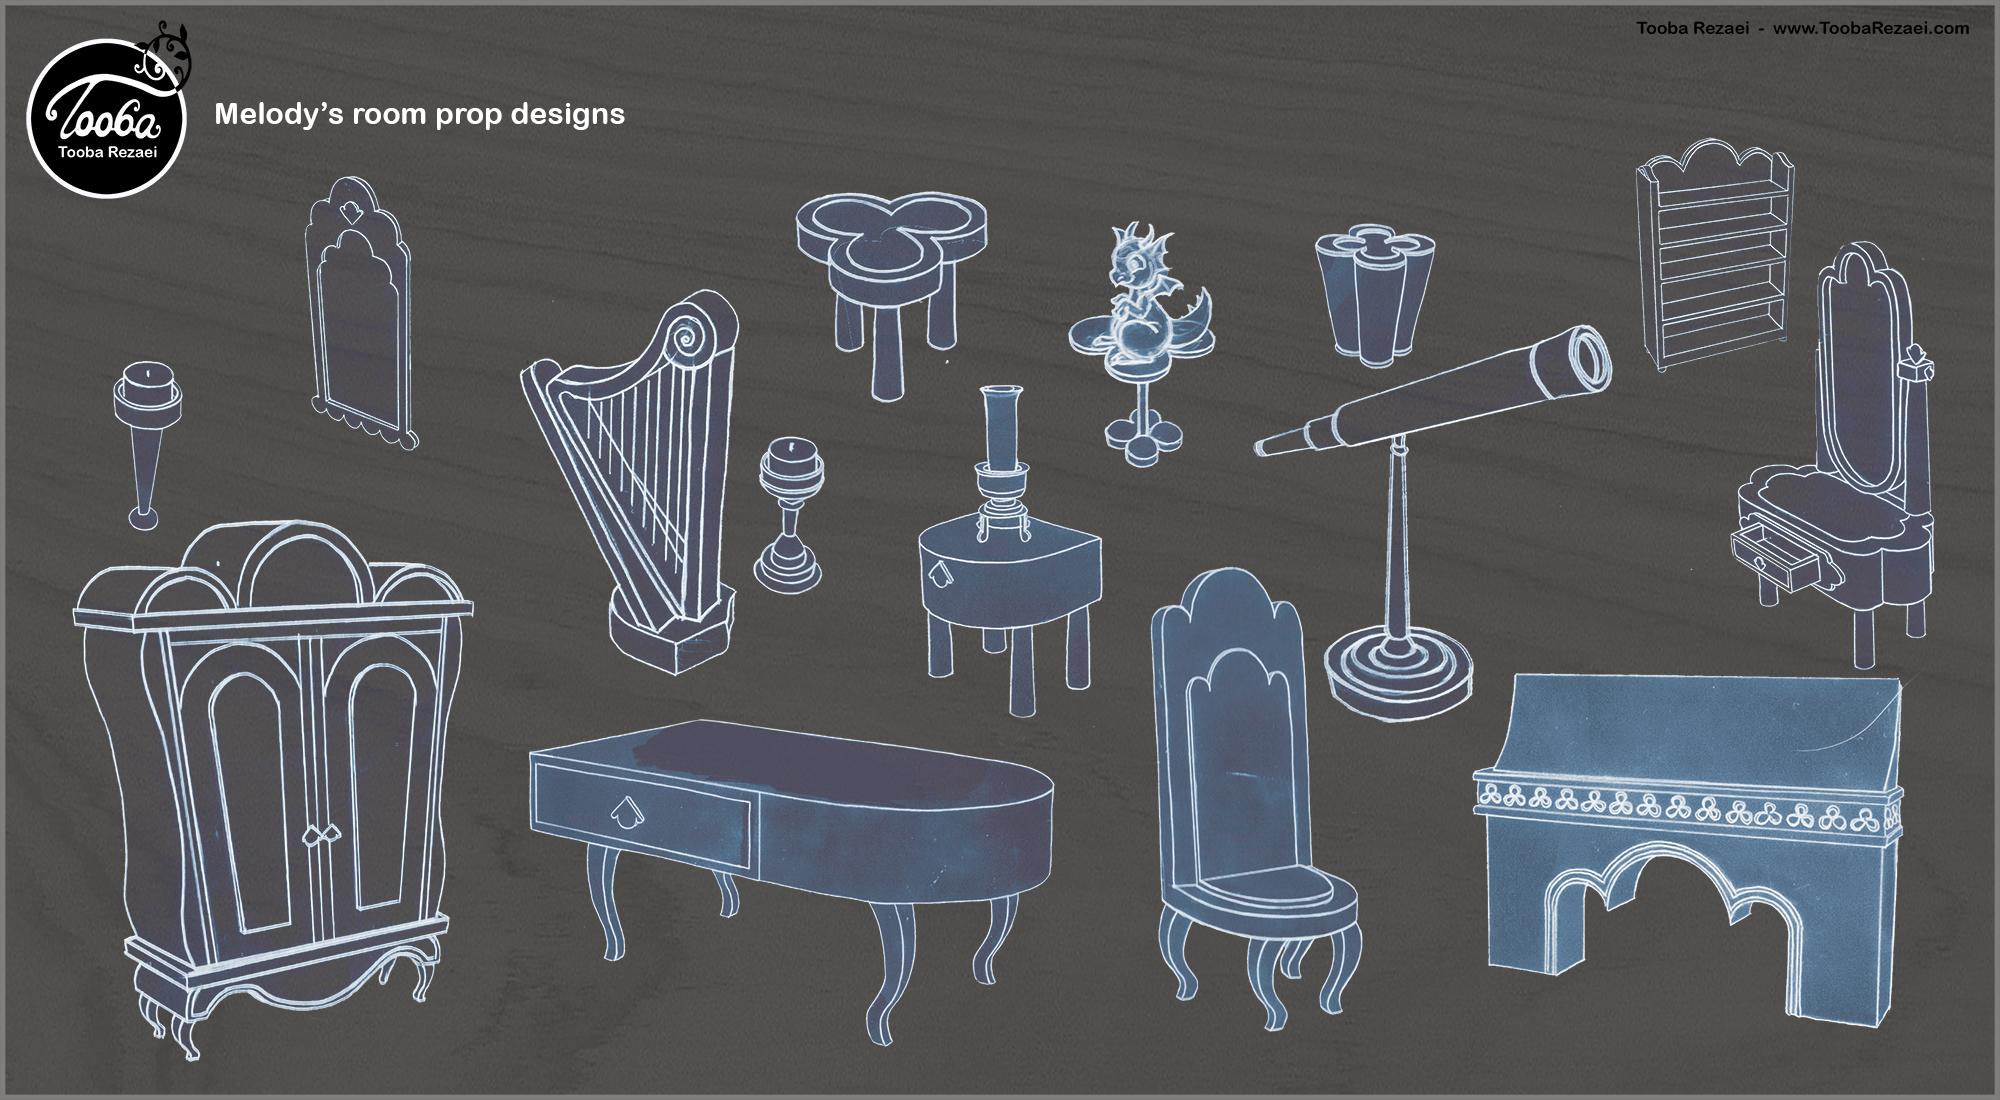 melody's room prop designs.jpg